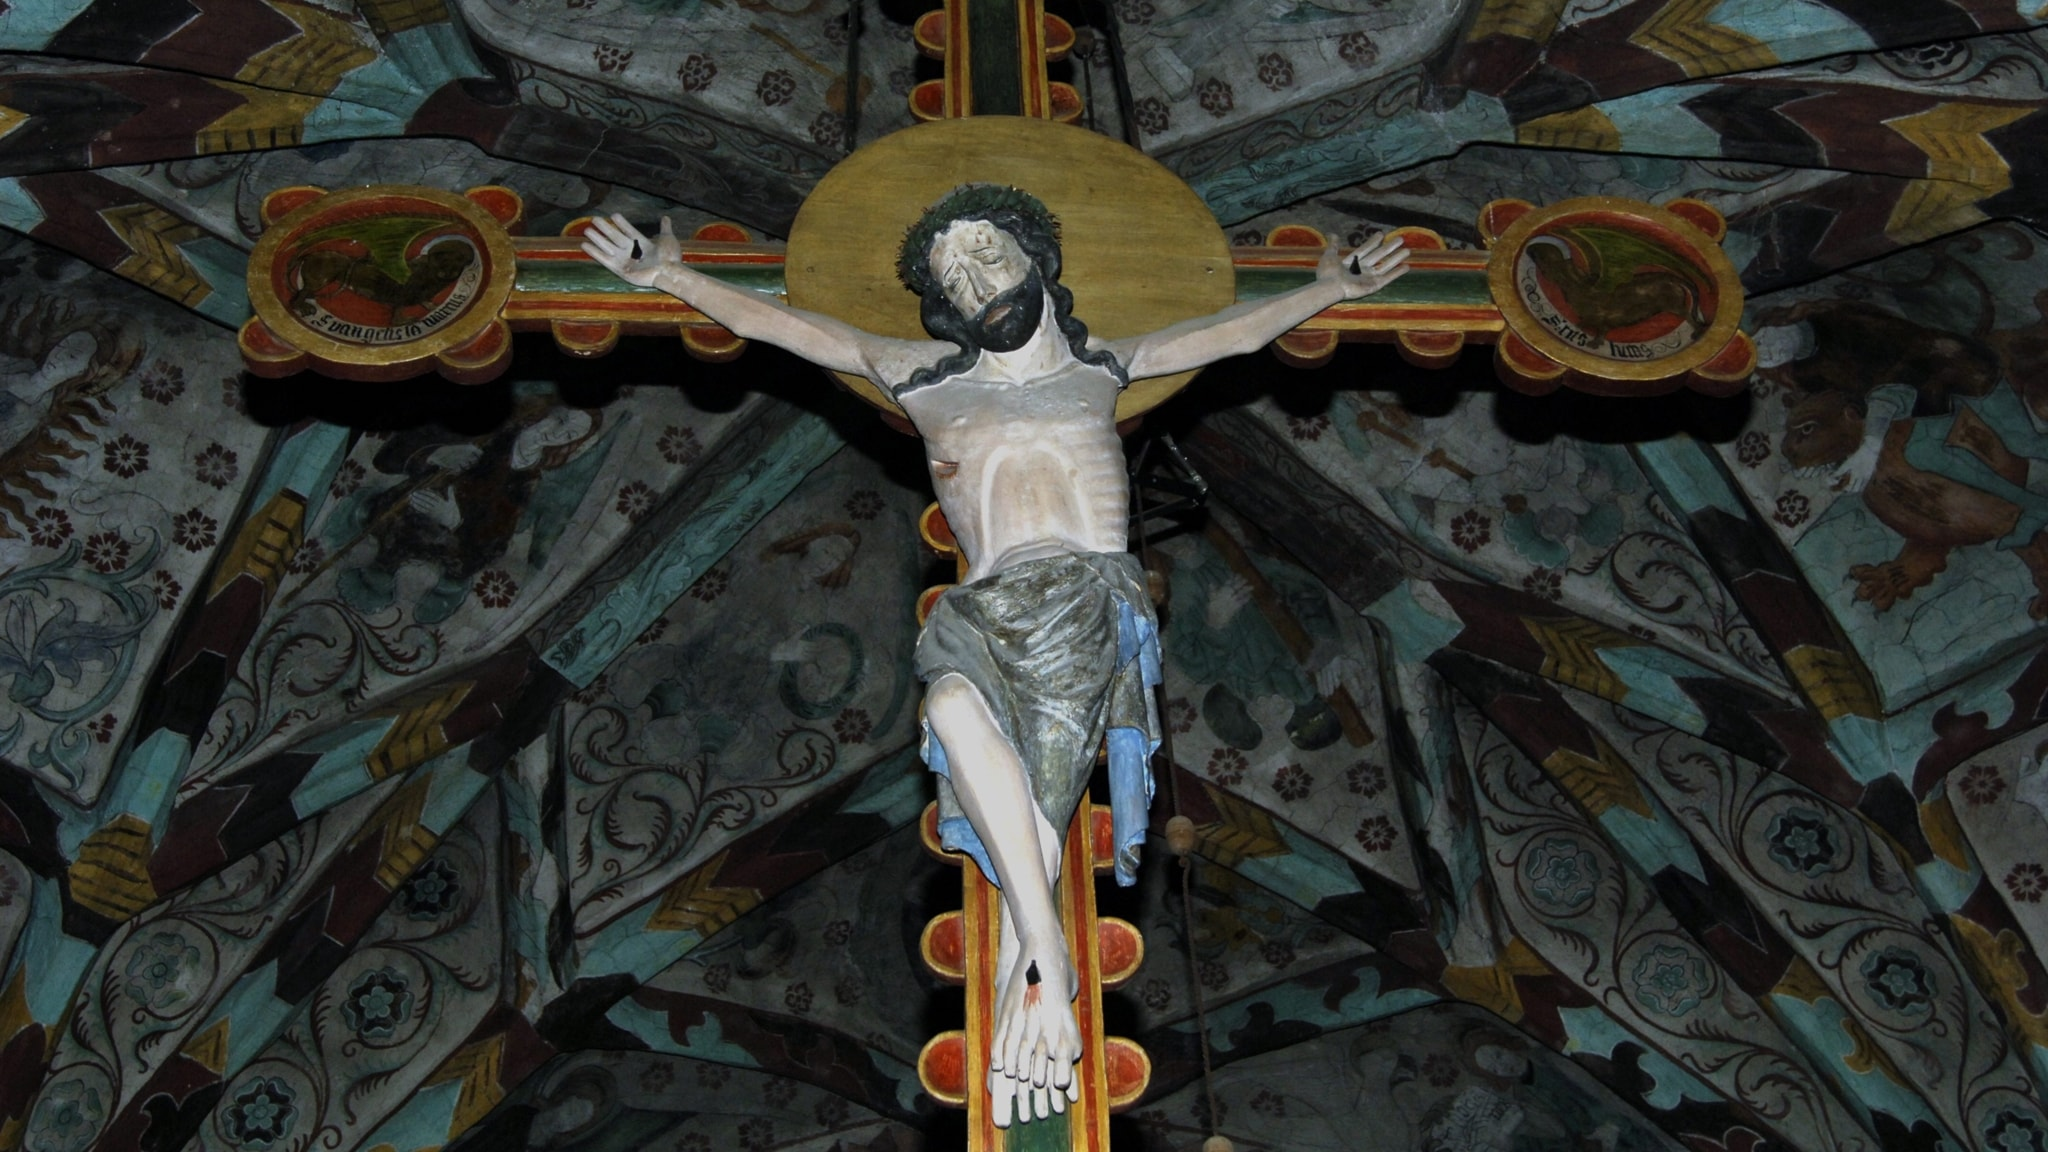 Vem var den historiske Jesus? (Repris)